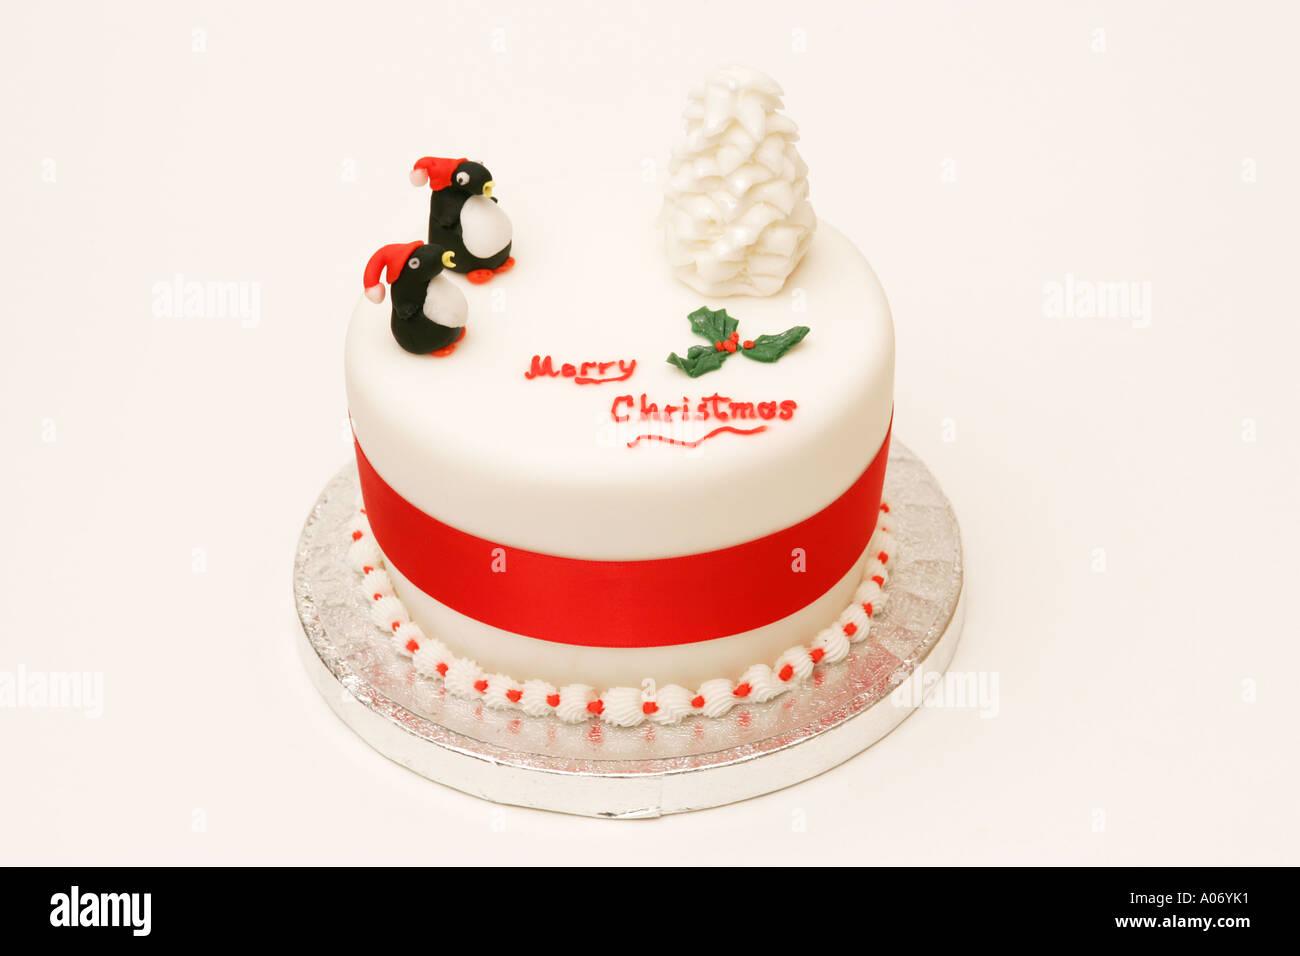 offset traditional seasonal festive british xmas cake with novelty iced tree and penguin decorations merry christmas - British Christmas Cake Decorations